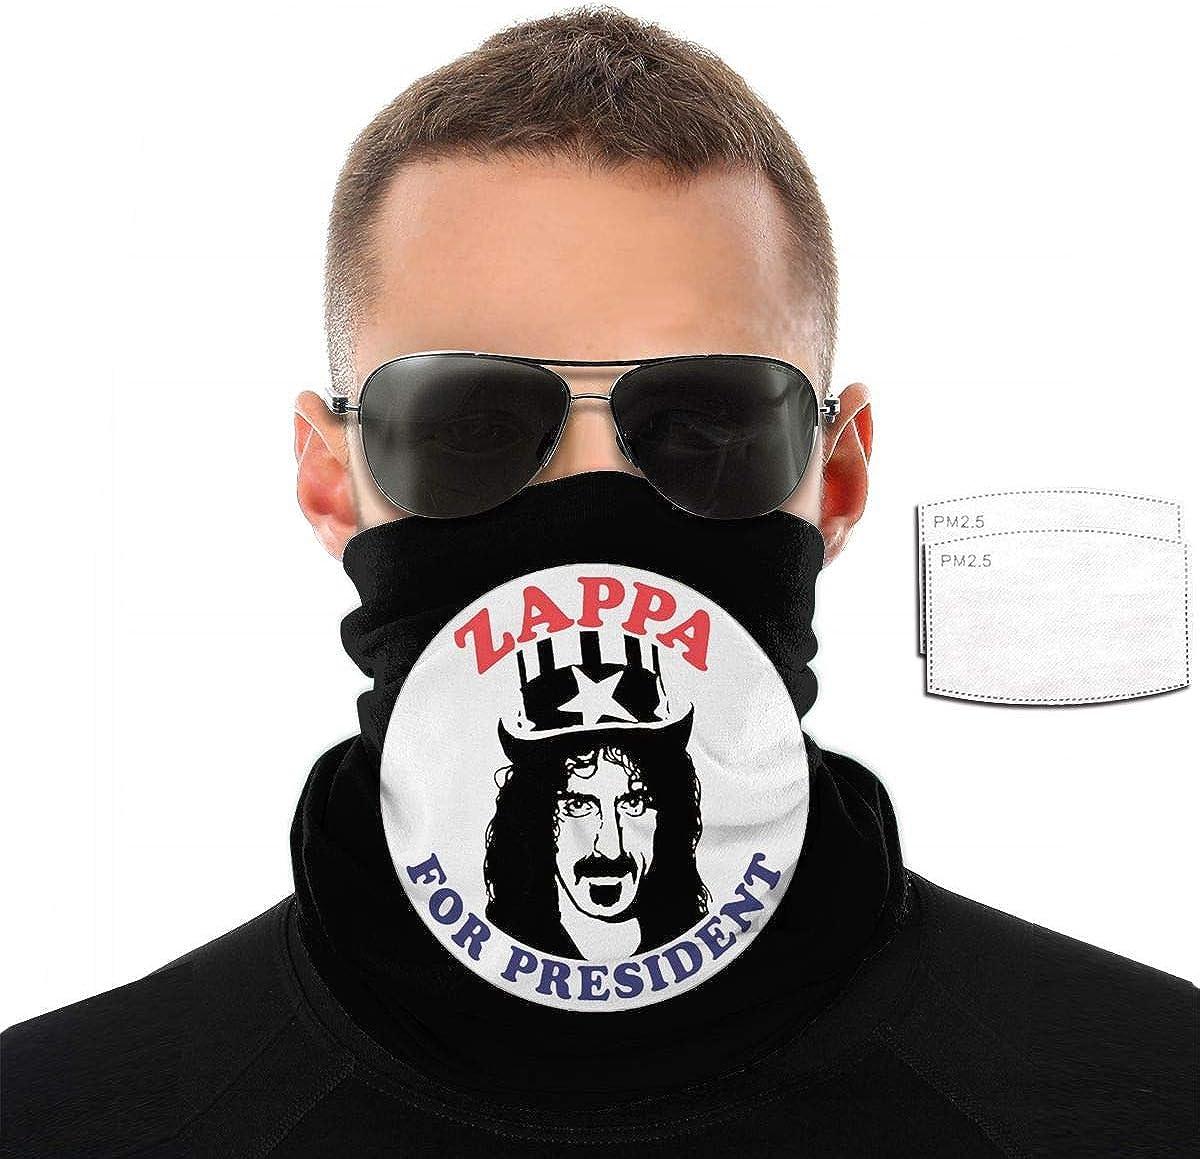 Frank Zappa Bandana with A Filtration Mask Outdoor Balaclava Personality Mask for Summer Cycling Hiking Fishing